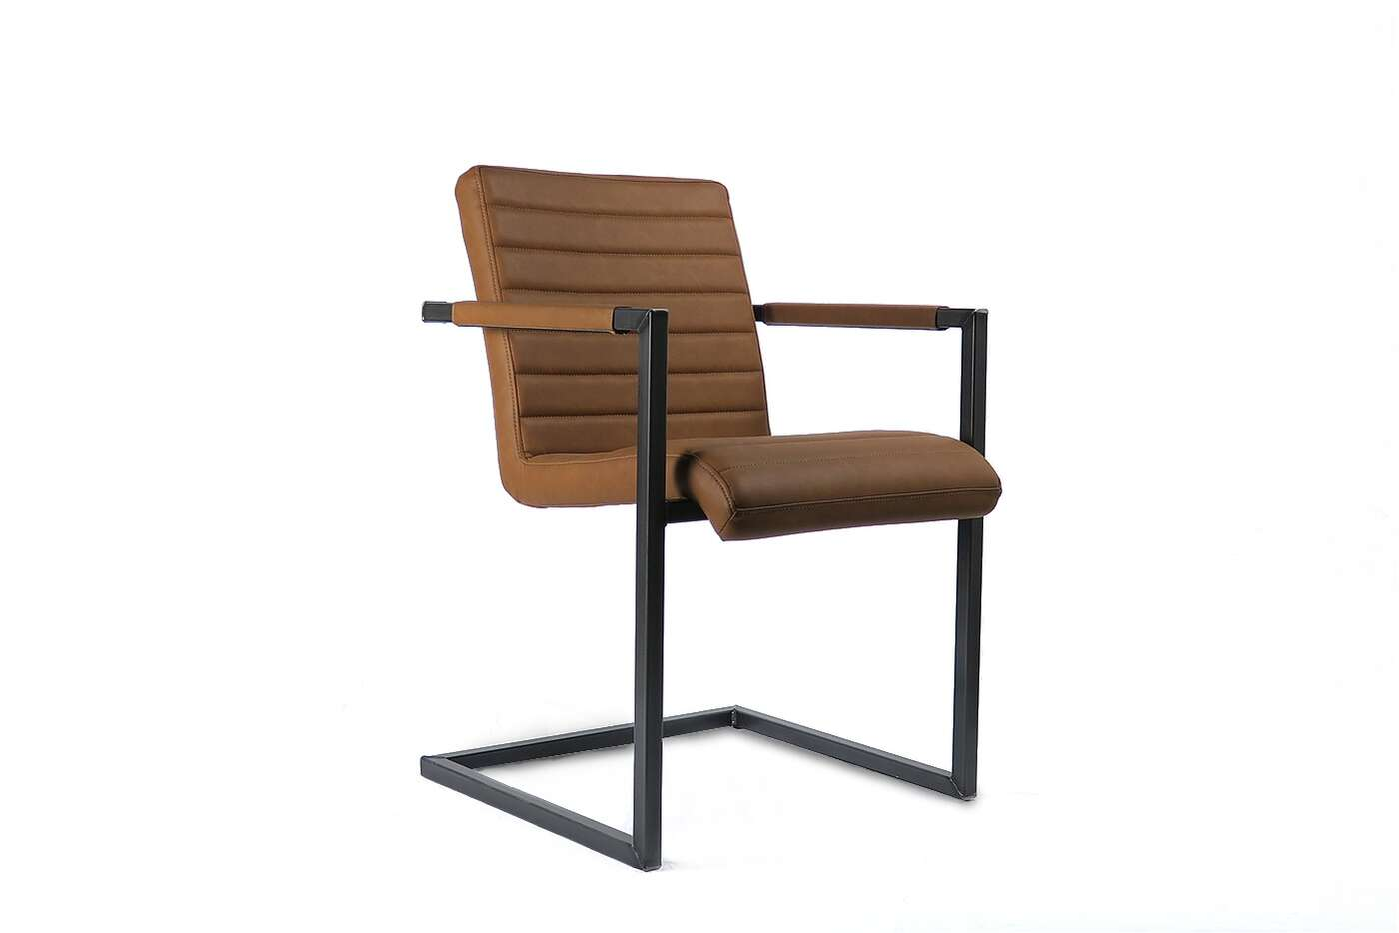 Industriedesign Armlehnstuhl Janos